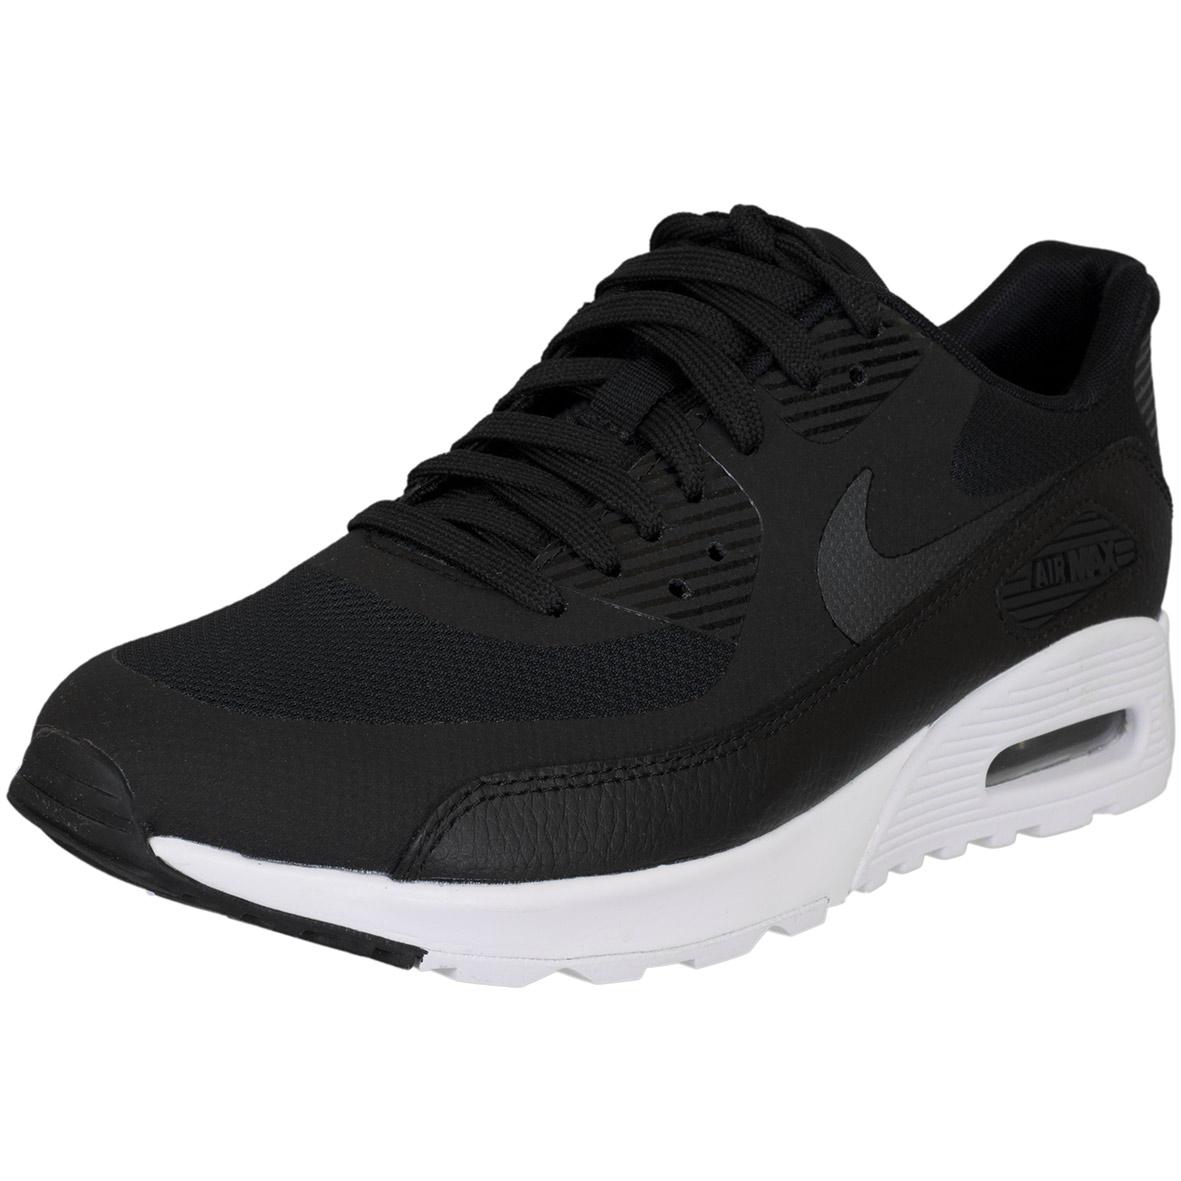 ☆ Nike Damen Sneaker Air Max 90 Ultra 2.0 schwarz/weiß - hier ...